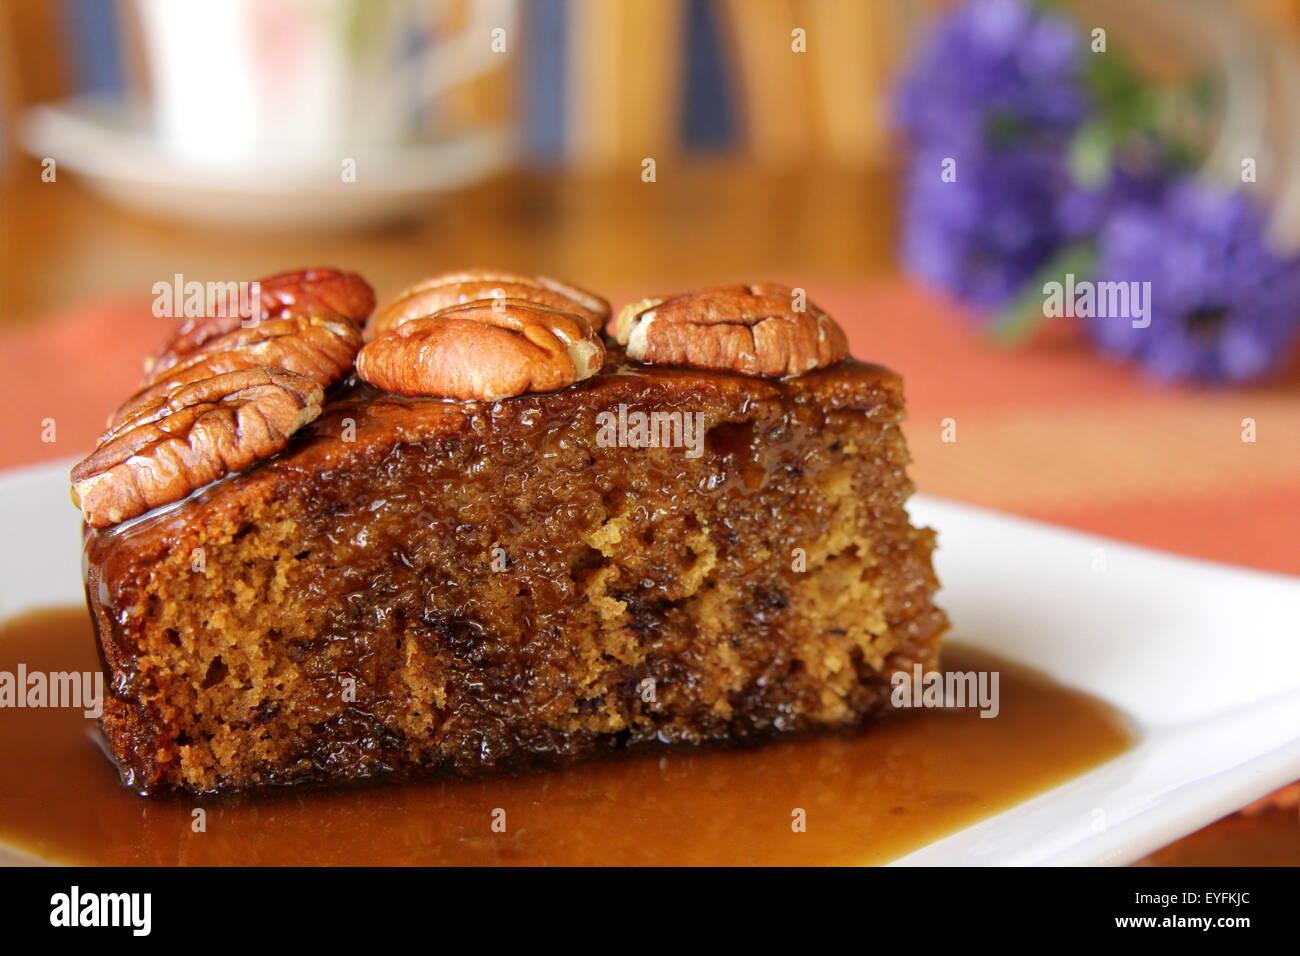 Sticky Date Pudding - Stock Image